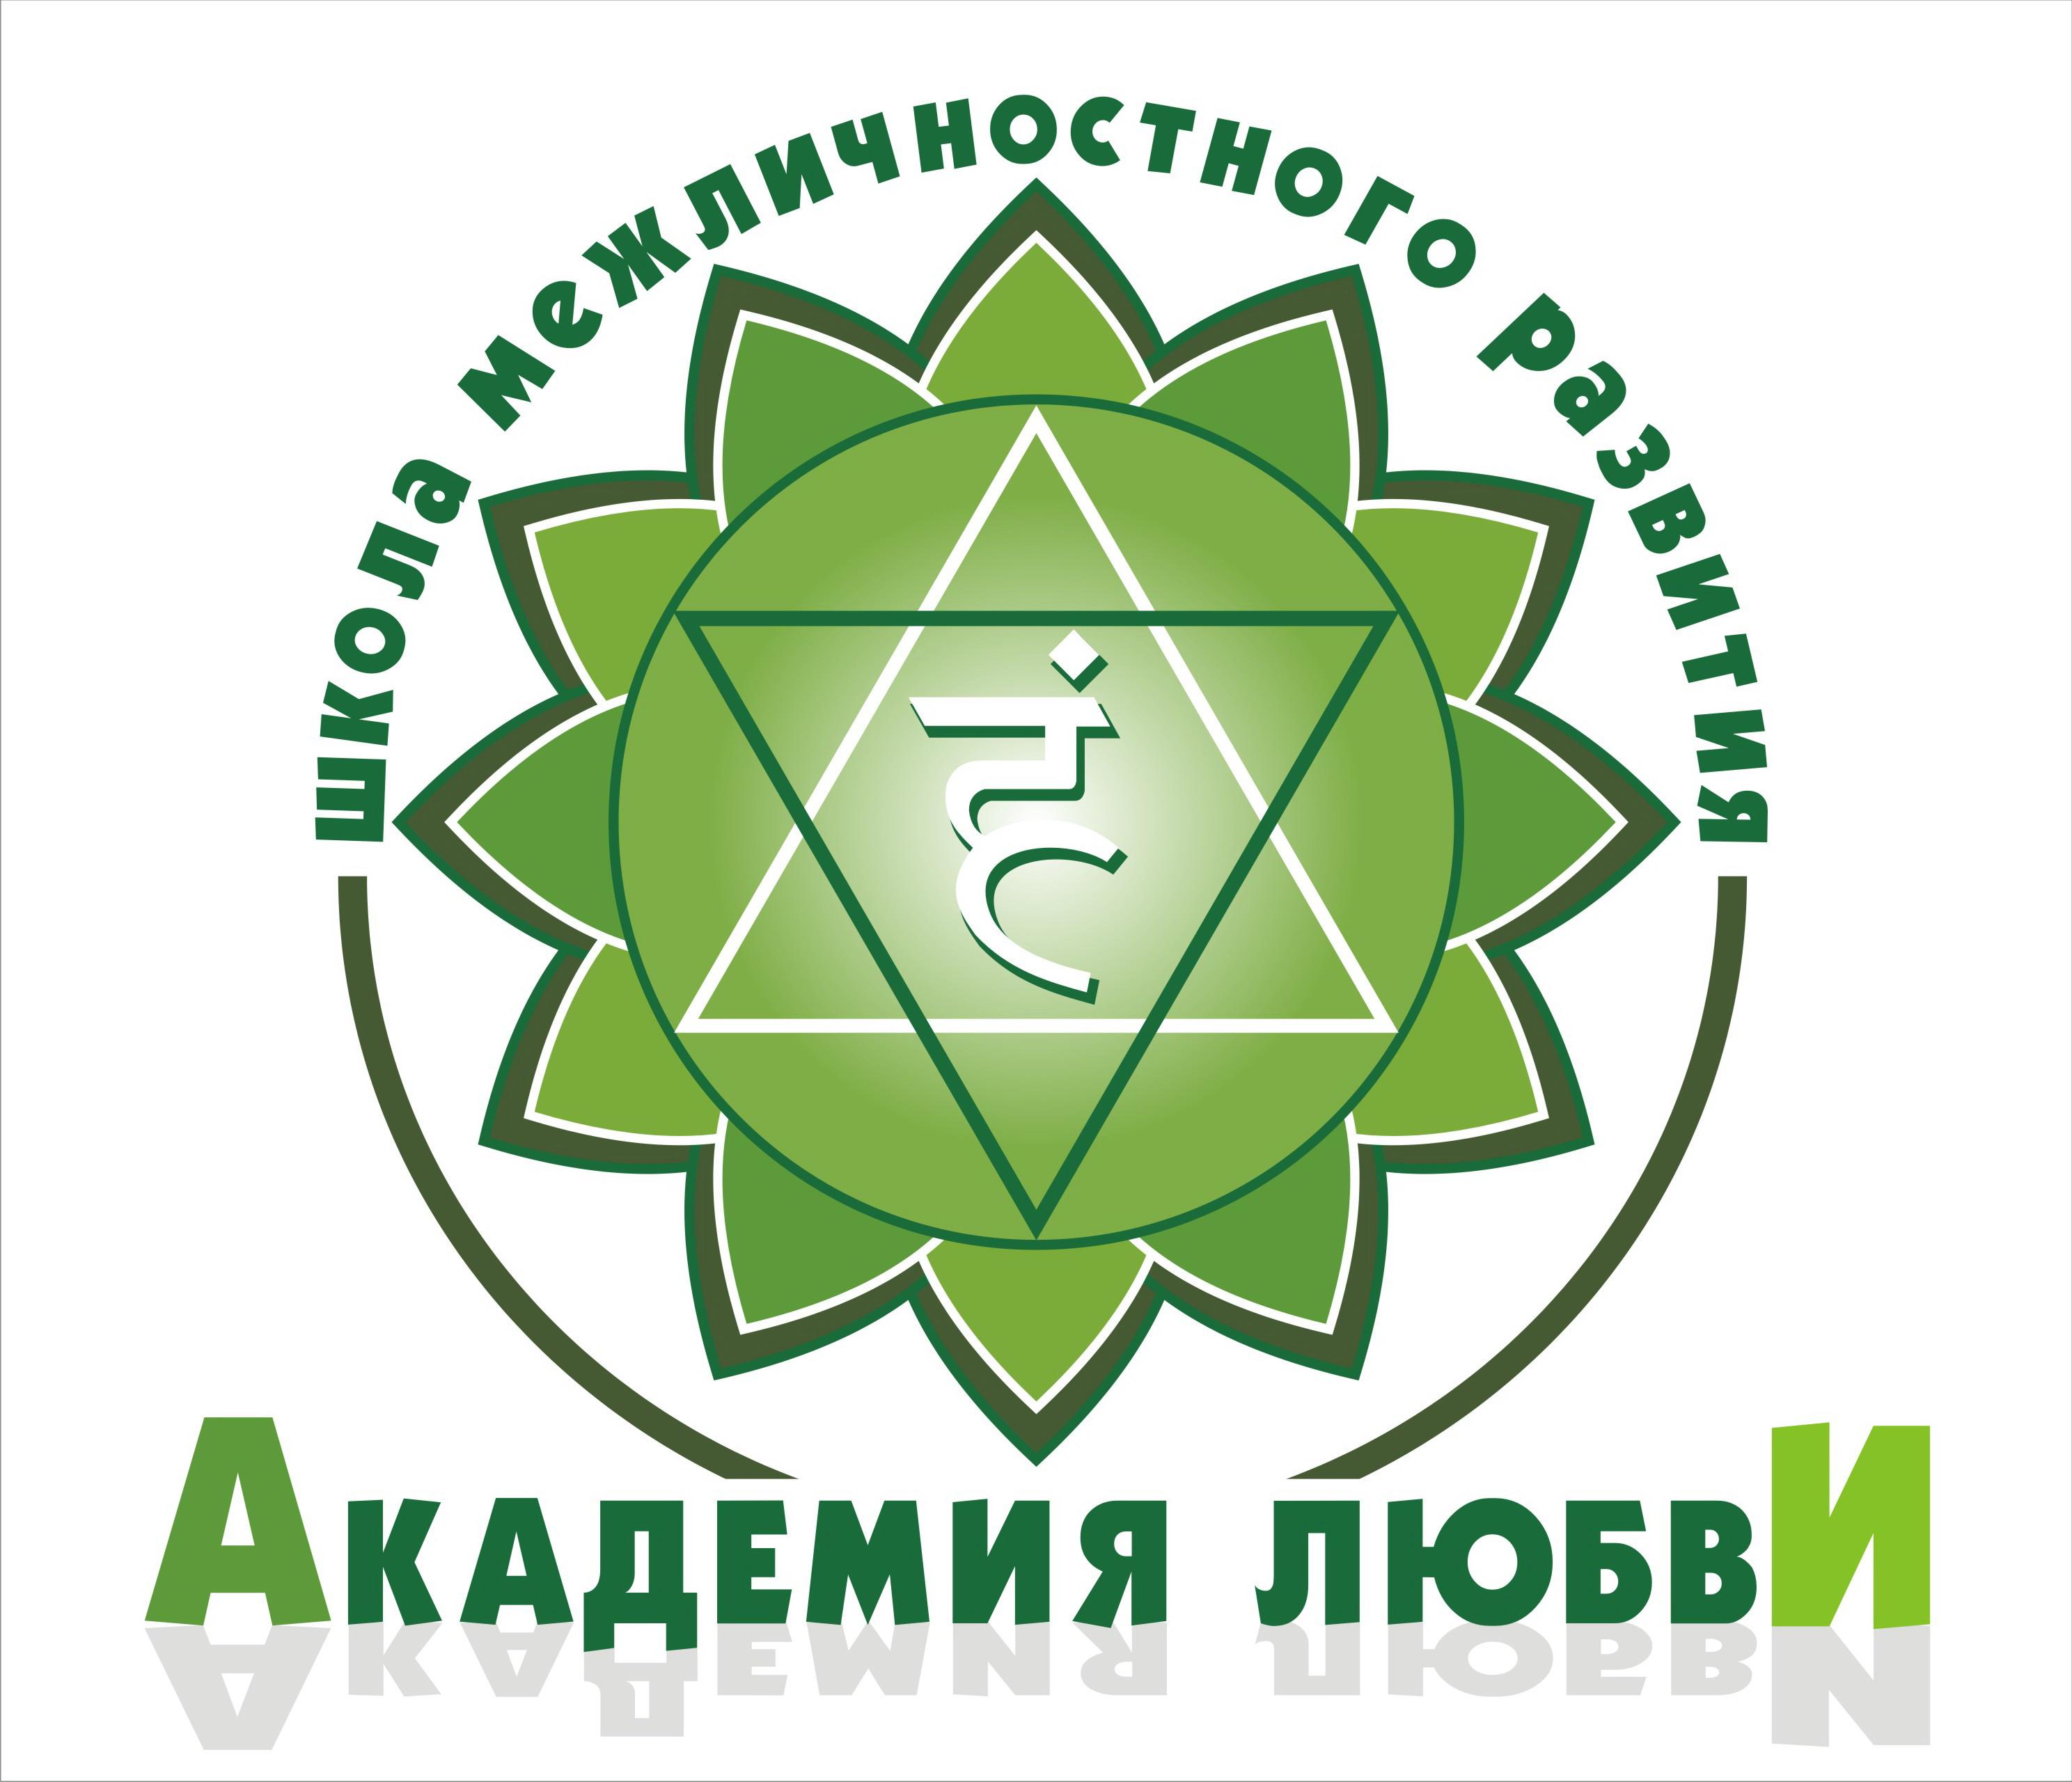 Лого интернет магазин нижний тагил ...: pictures11.ru/logo-internet-magazin-nizhnij-tagil.html